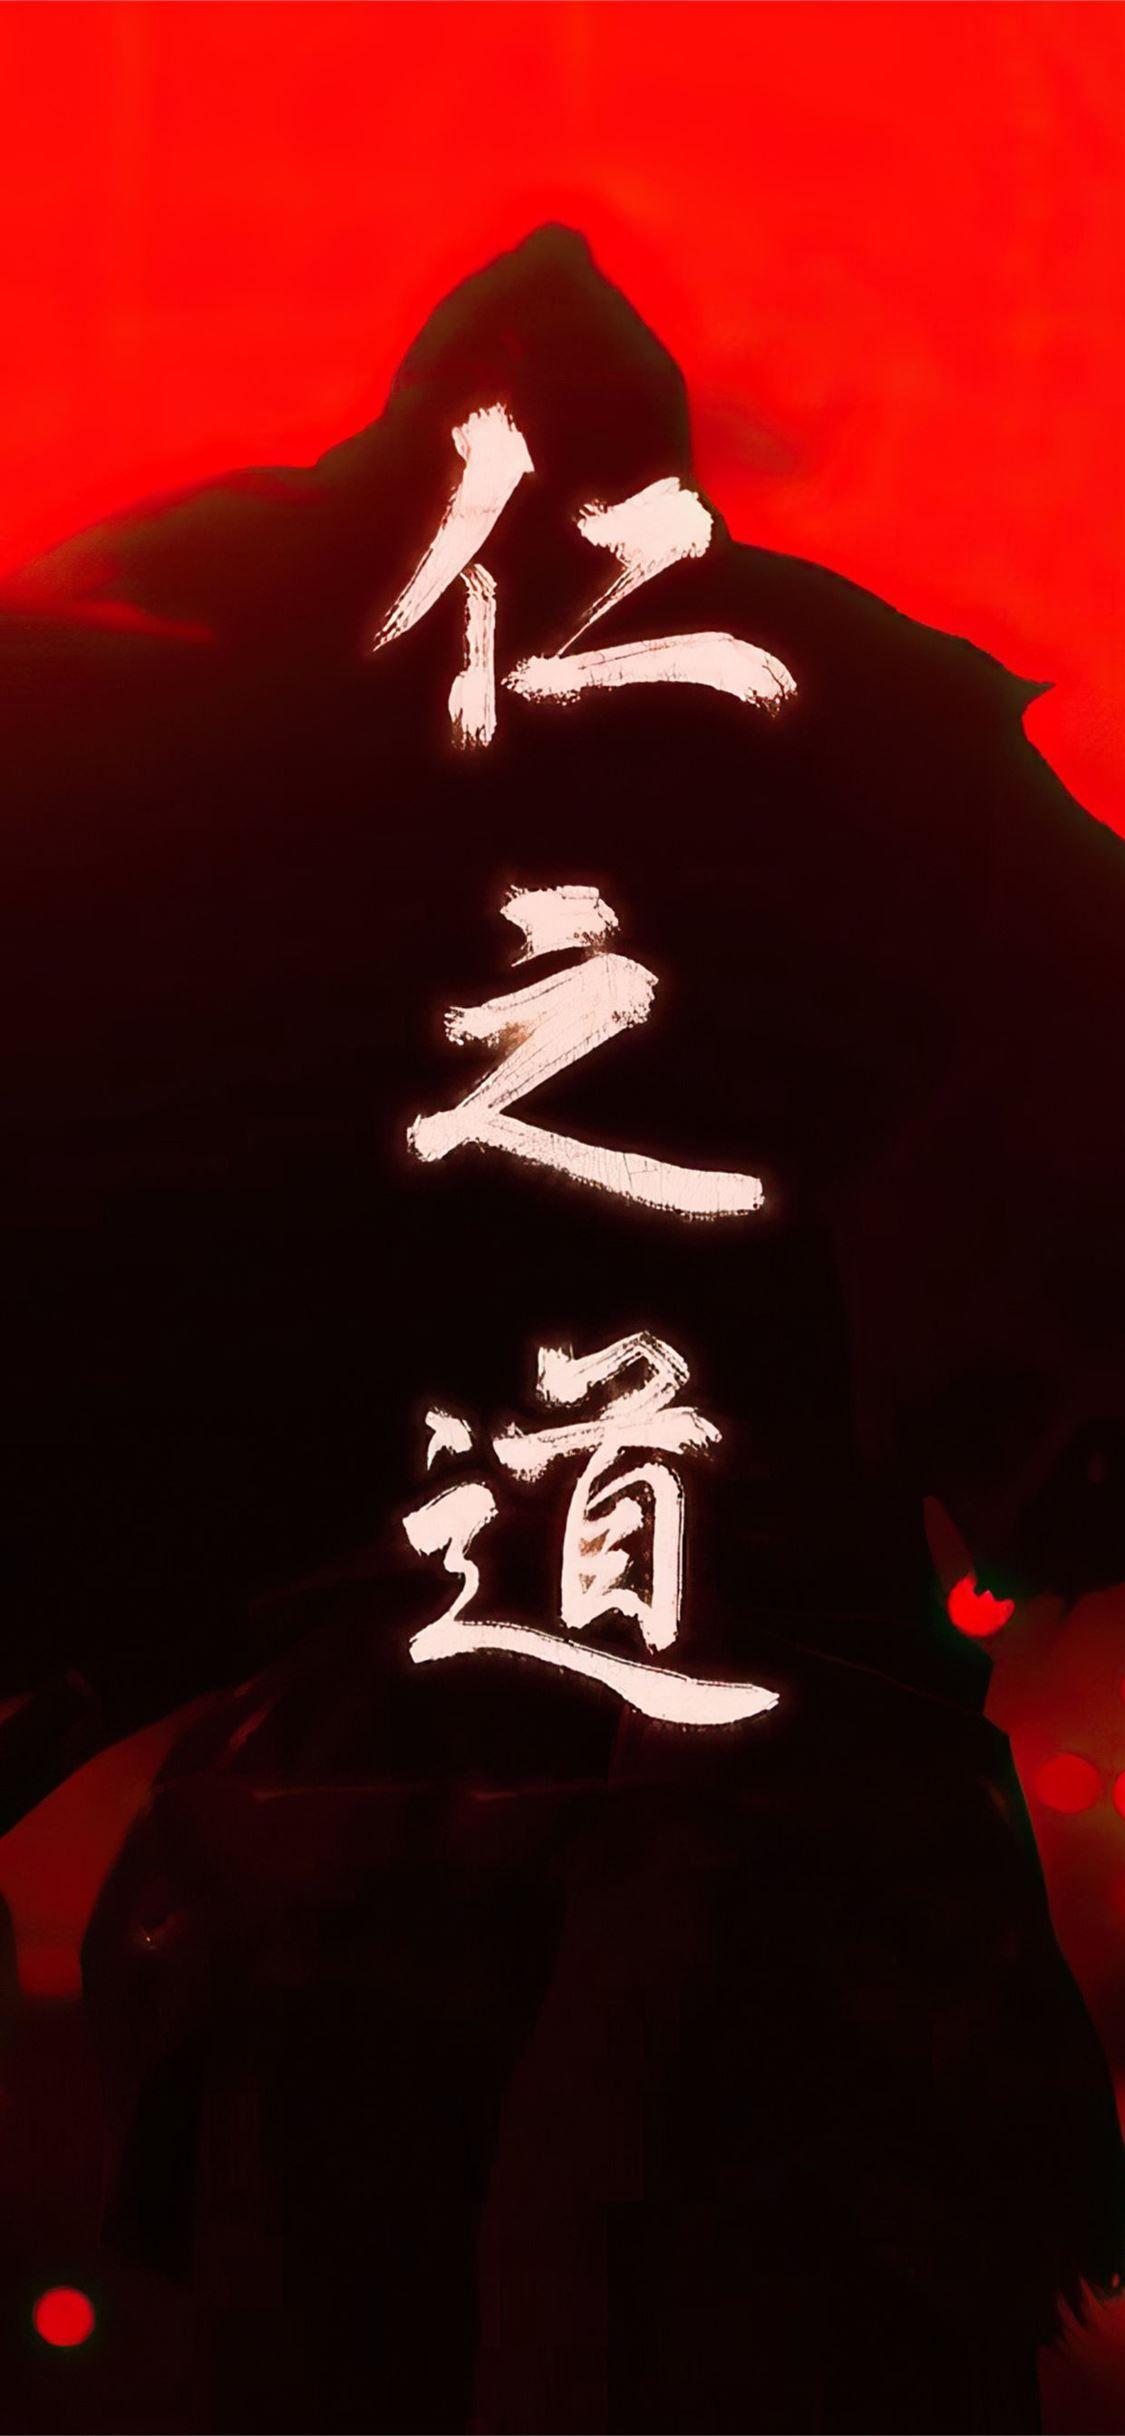 Ghost Of Tsuhima 4k Ghostoftsushima 2020games Games 4k Iphone11wallpaper Iphone 11 Wallpaper Ghost Of Tsushima Wallpaper Ghost Of Tsushima Wallpaper 4k Iphone 4k ghost of tsushima logo